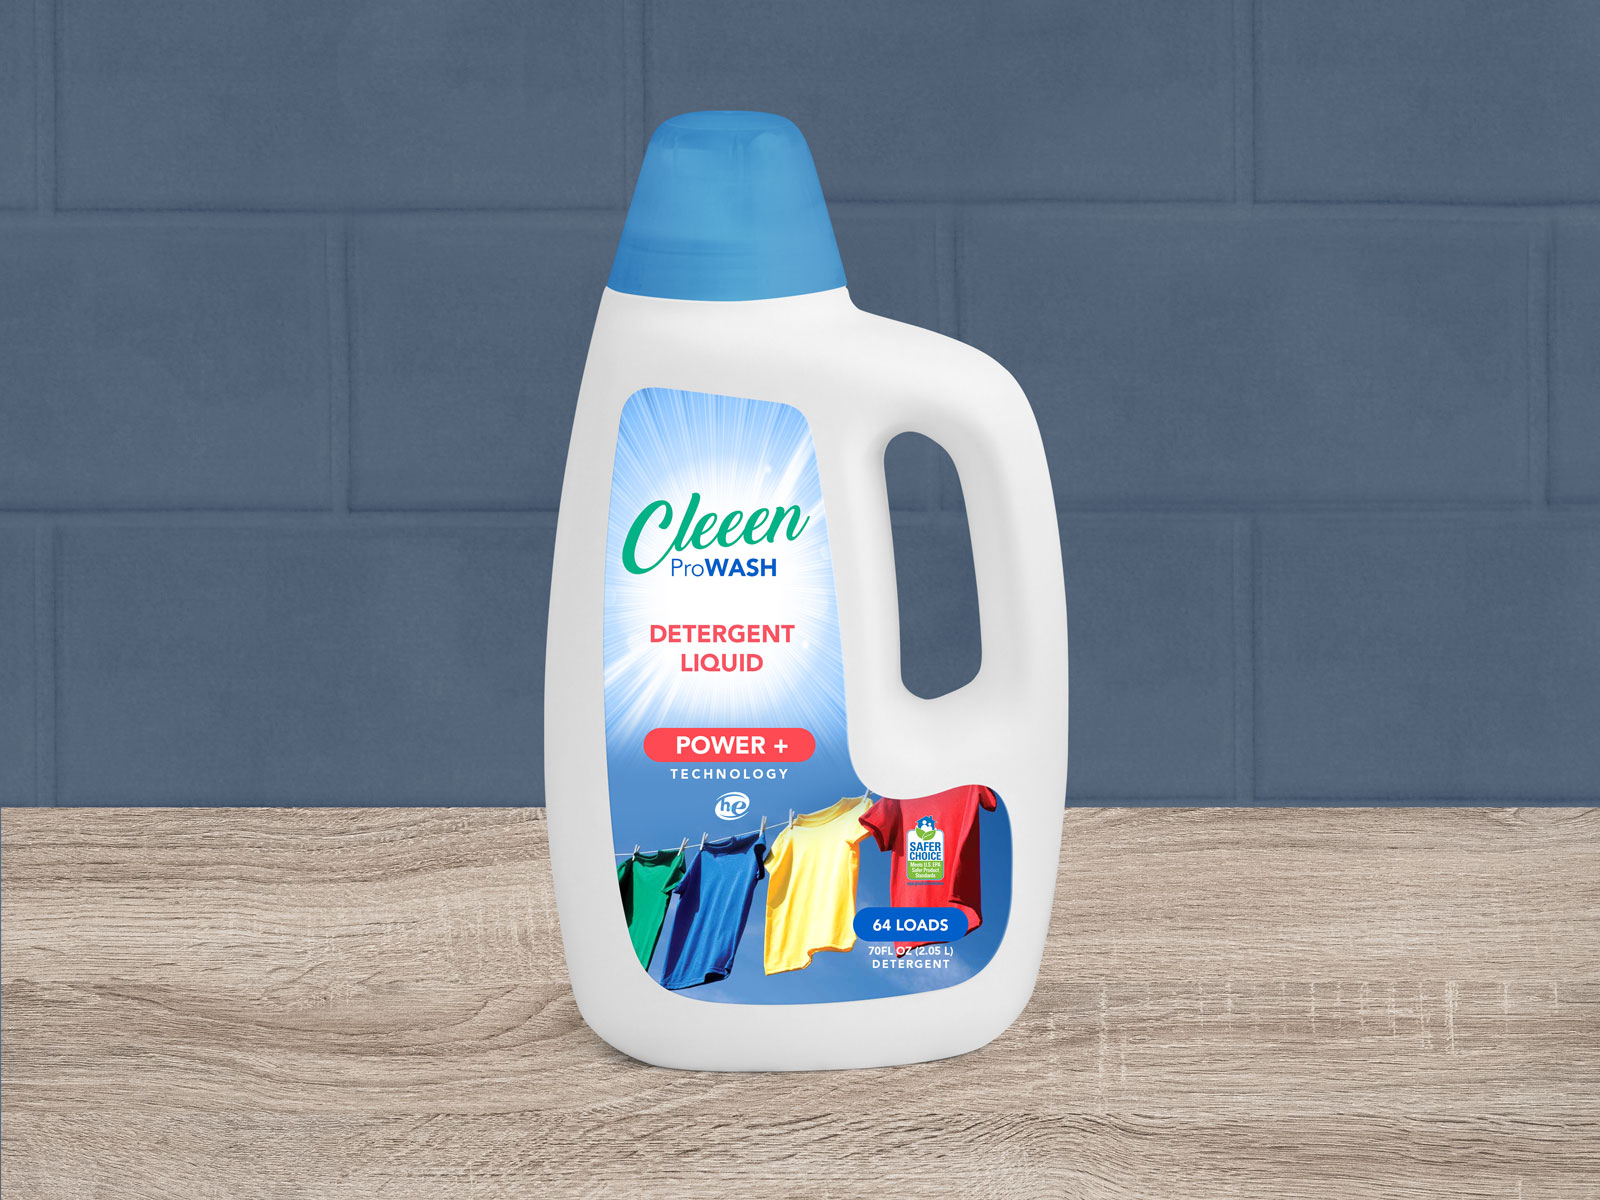 Free-Liquid-Detergent-Bottle-Mockup-PSD-4